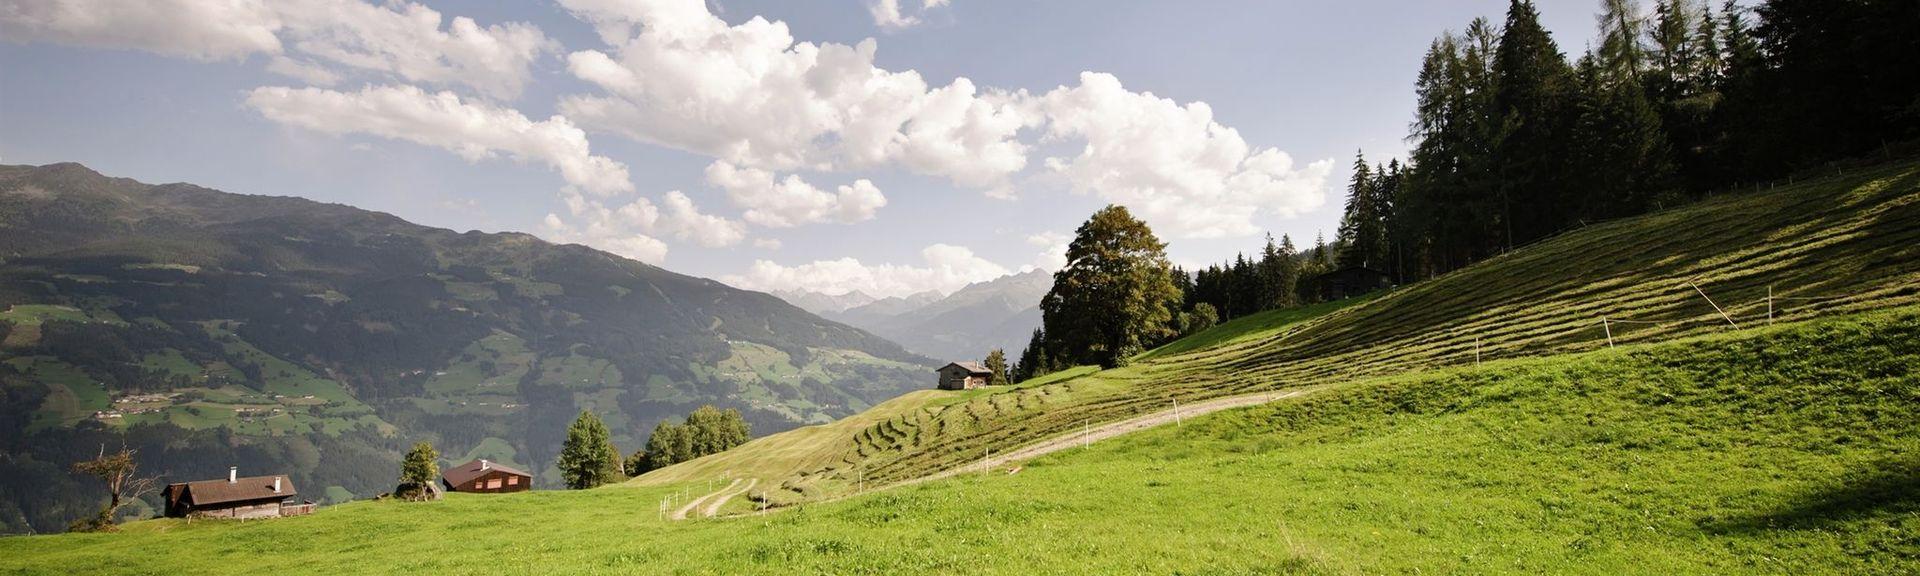 Fuegen, Tyrol, Austria